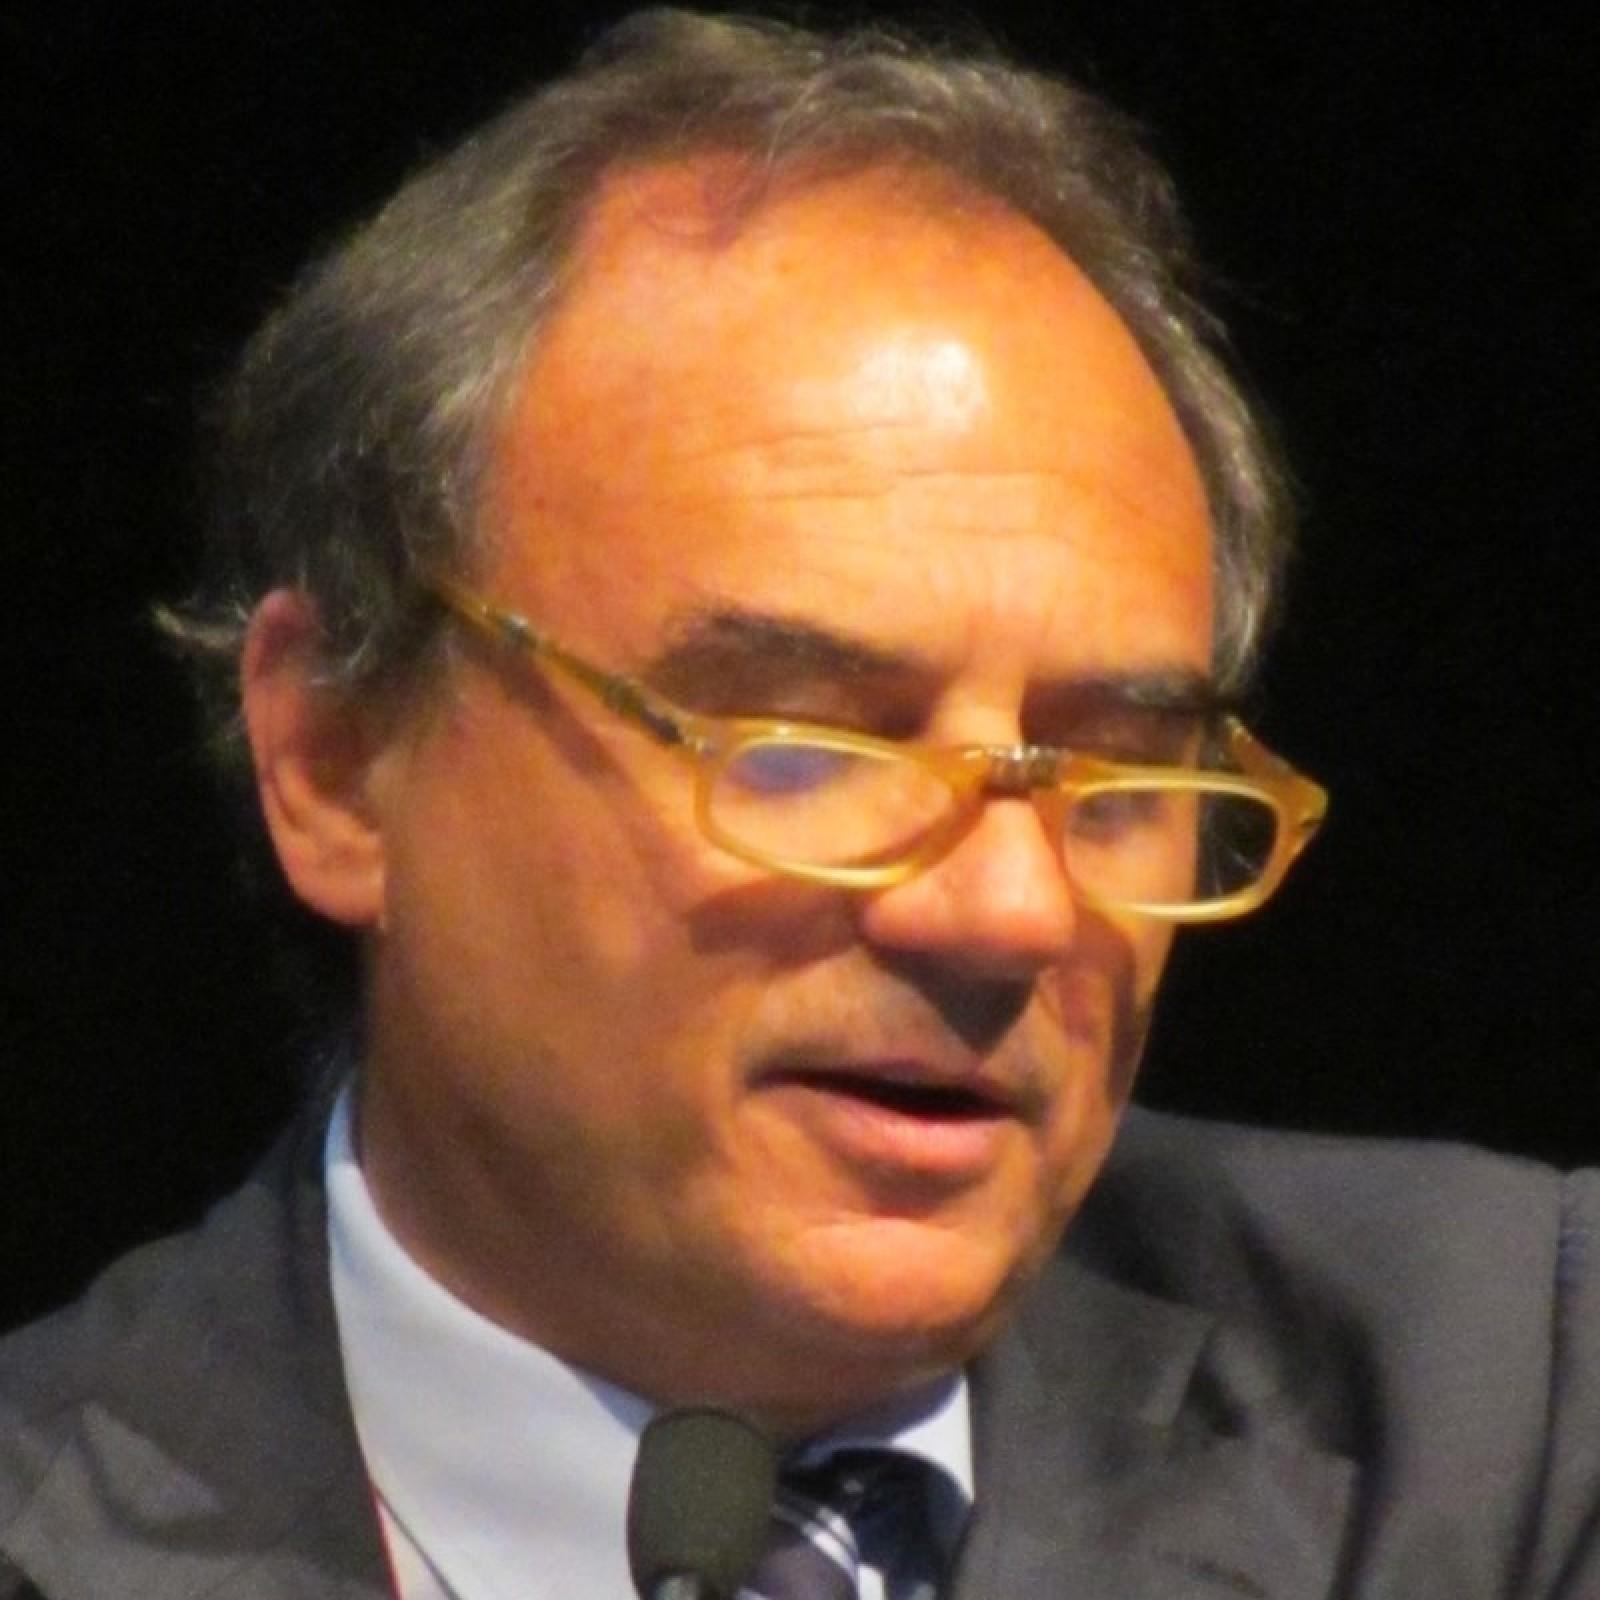 Dr. Stefano Nava